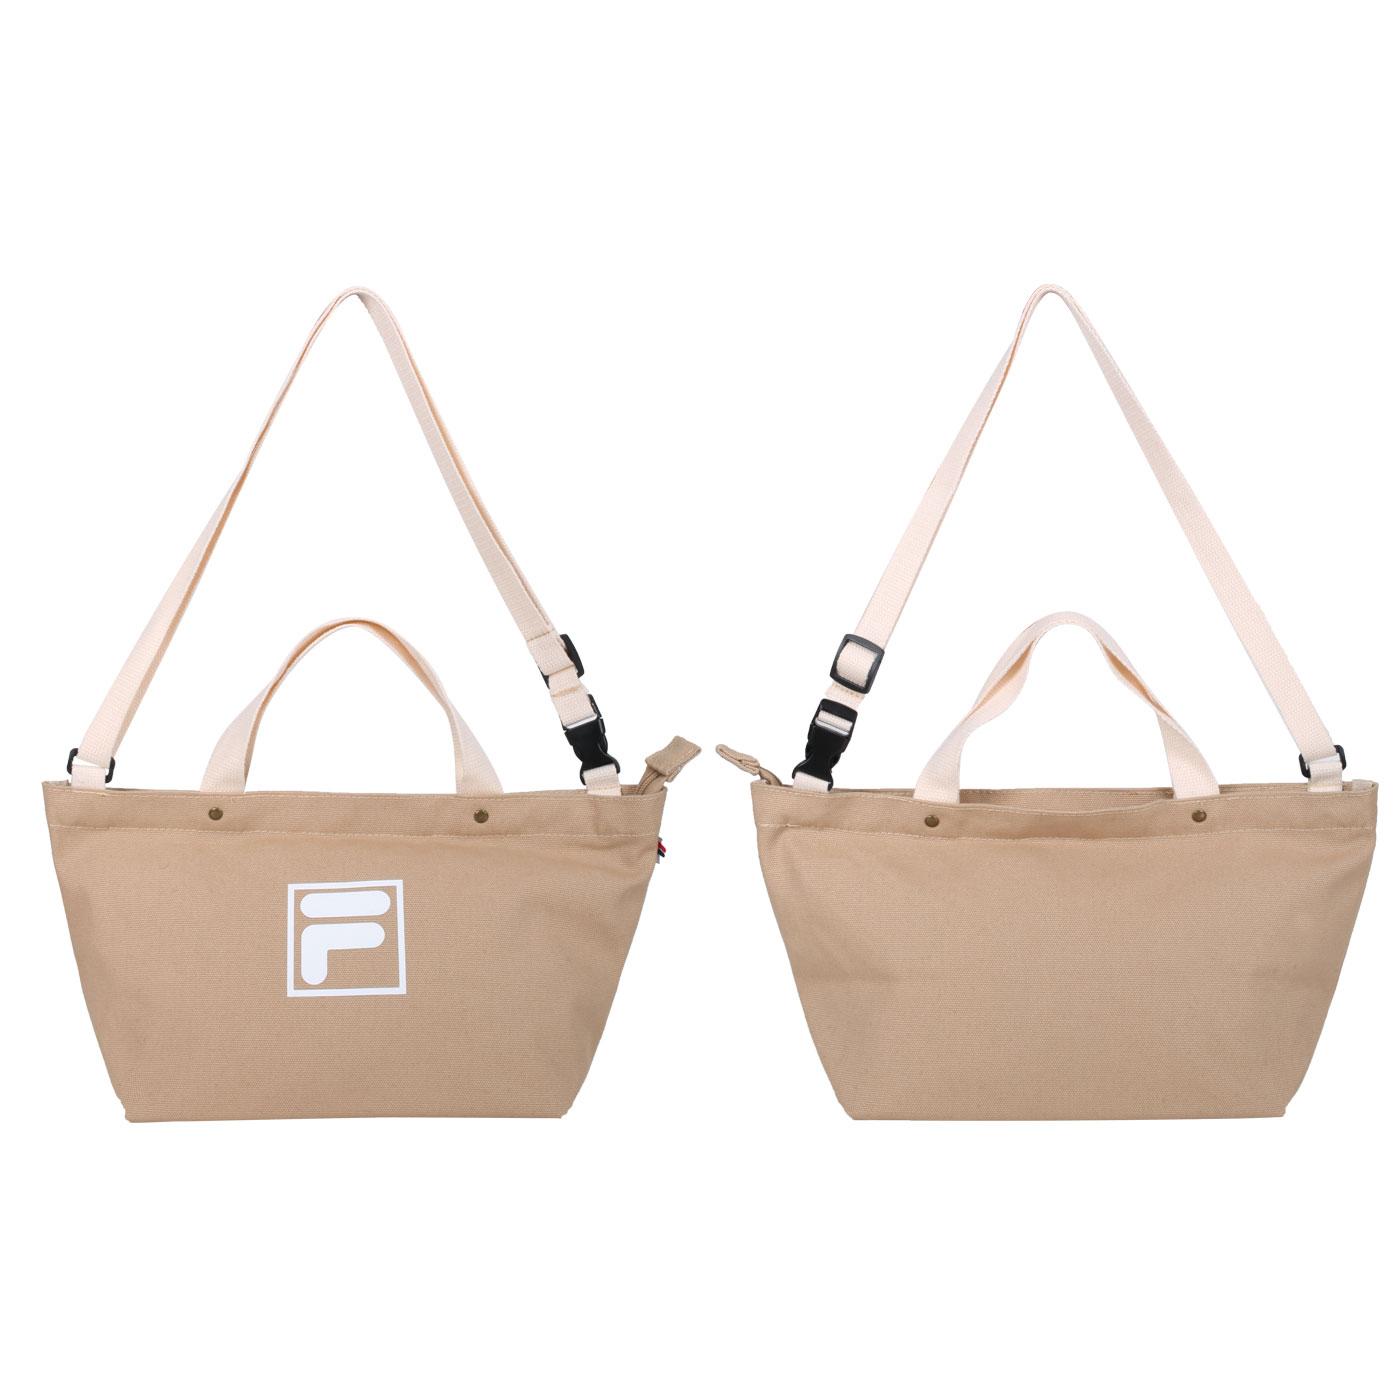 FILA 中型兩用帆布包 BMU-9009-KK - 奶茶白